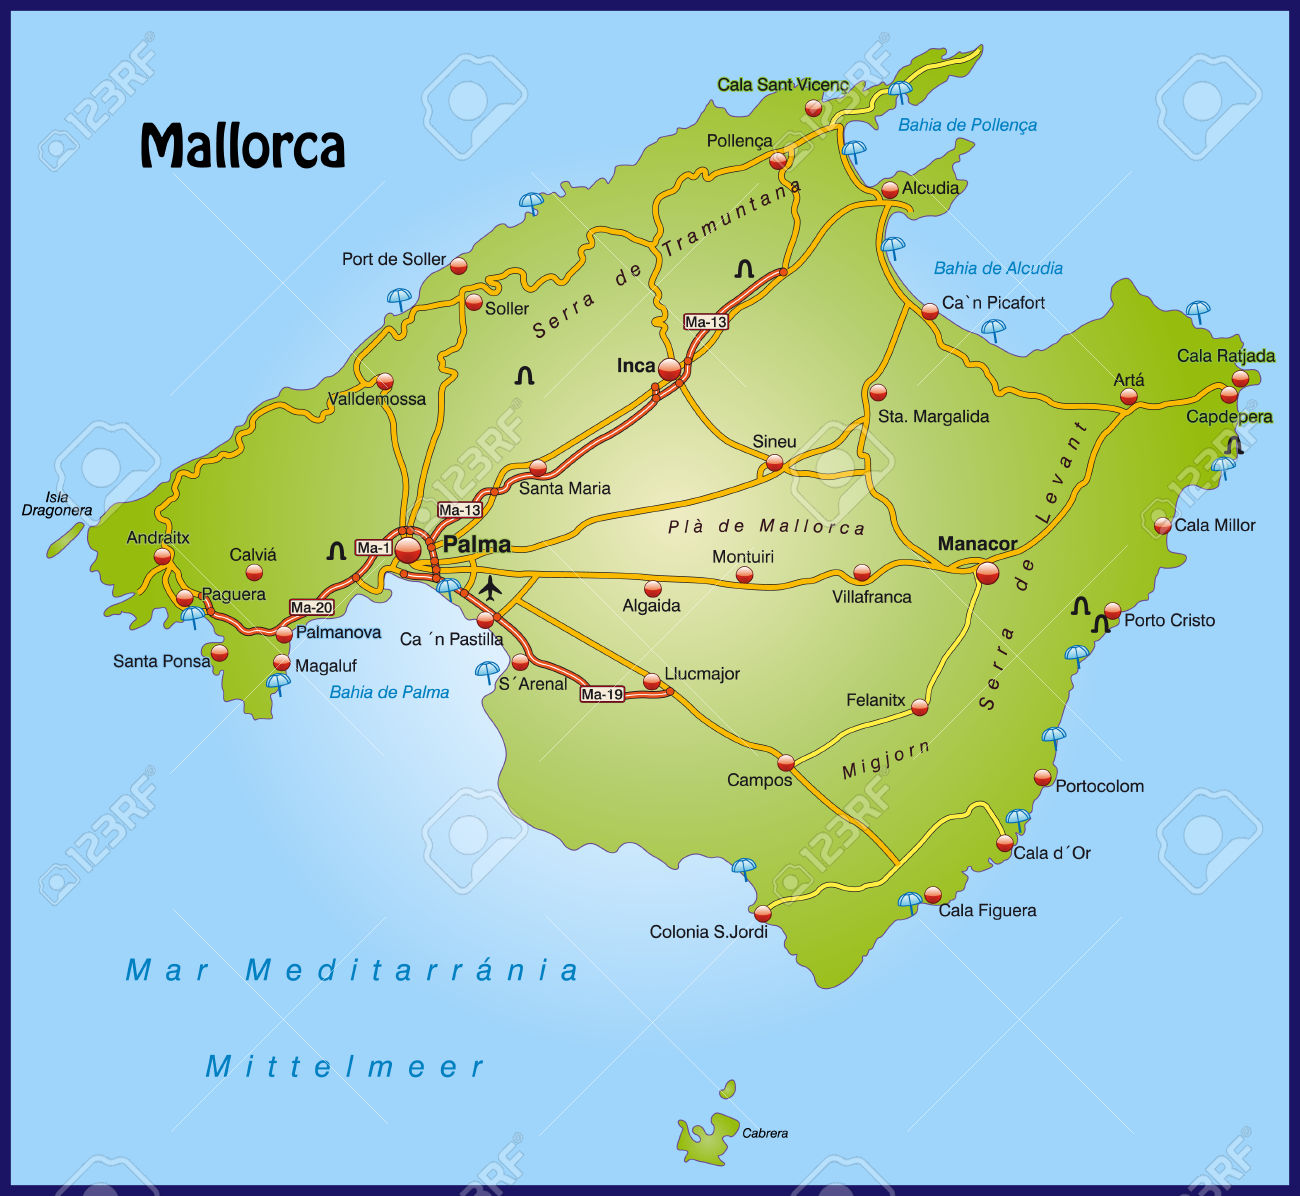 Islas Baleares Mapa Fisico.Mapa De Palma Mallorca Mapa Fisico Geografico Politico